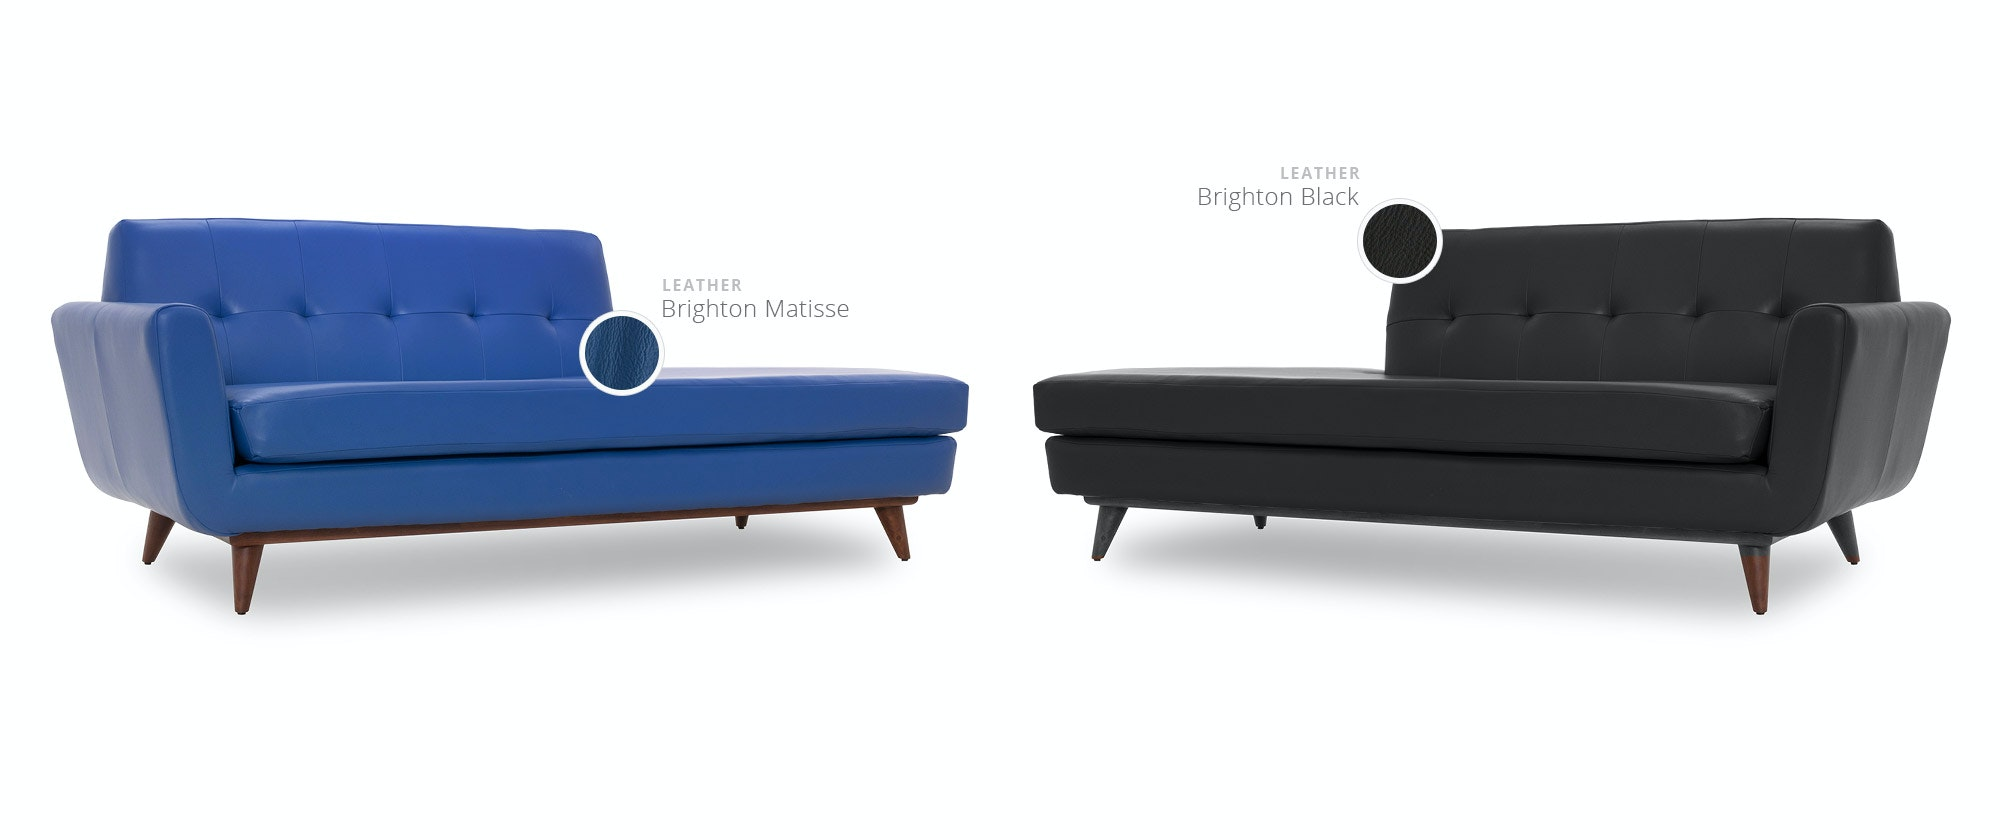 hughes leather chaise  joybird - shop by color